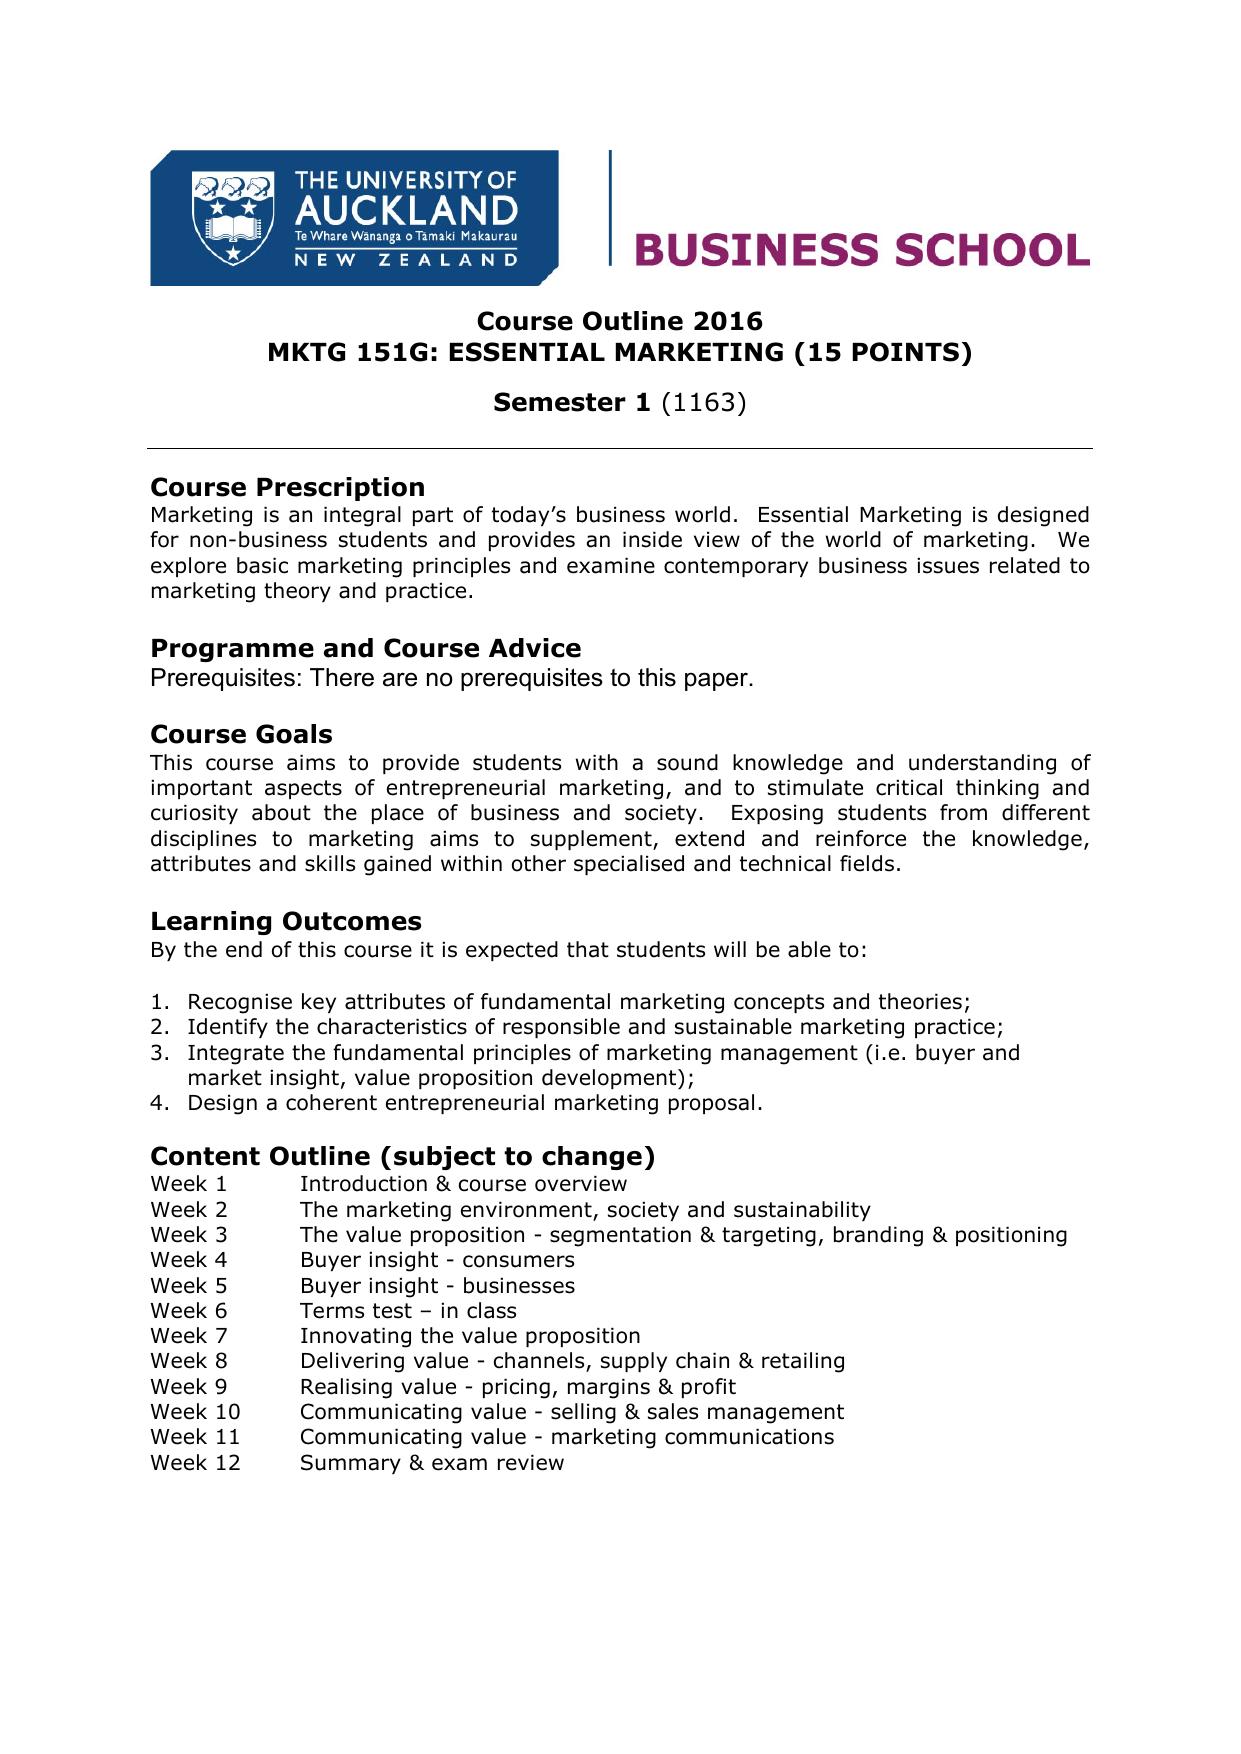 entrepreneurial marketing course outline